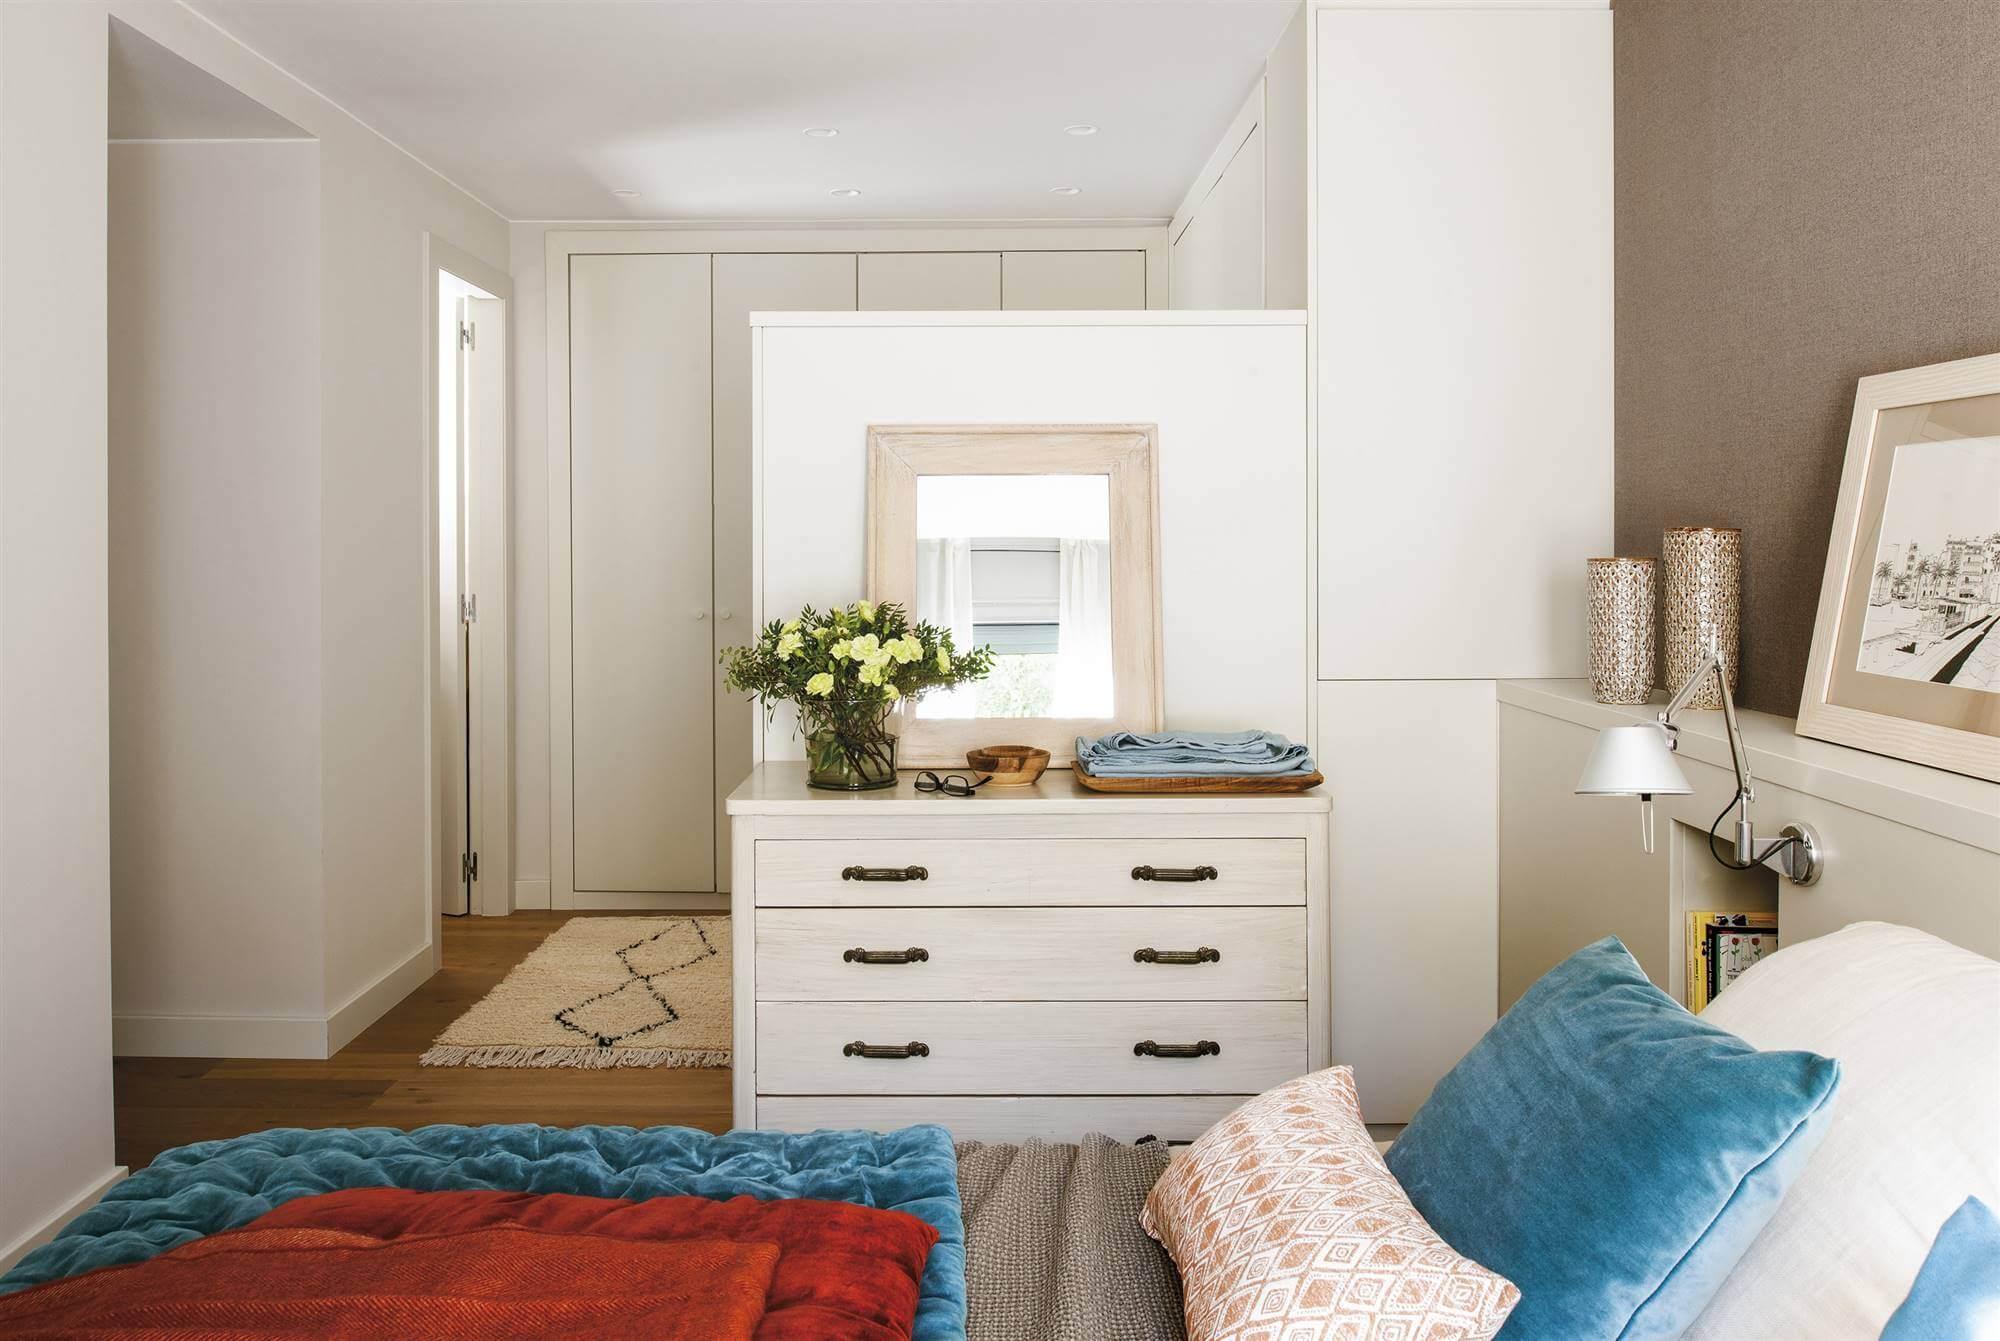 Небольшая спальная комната